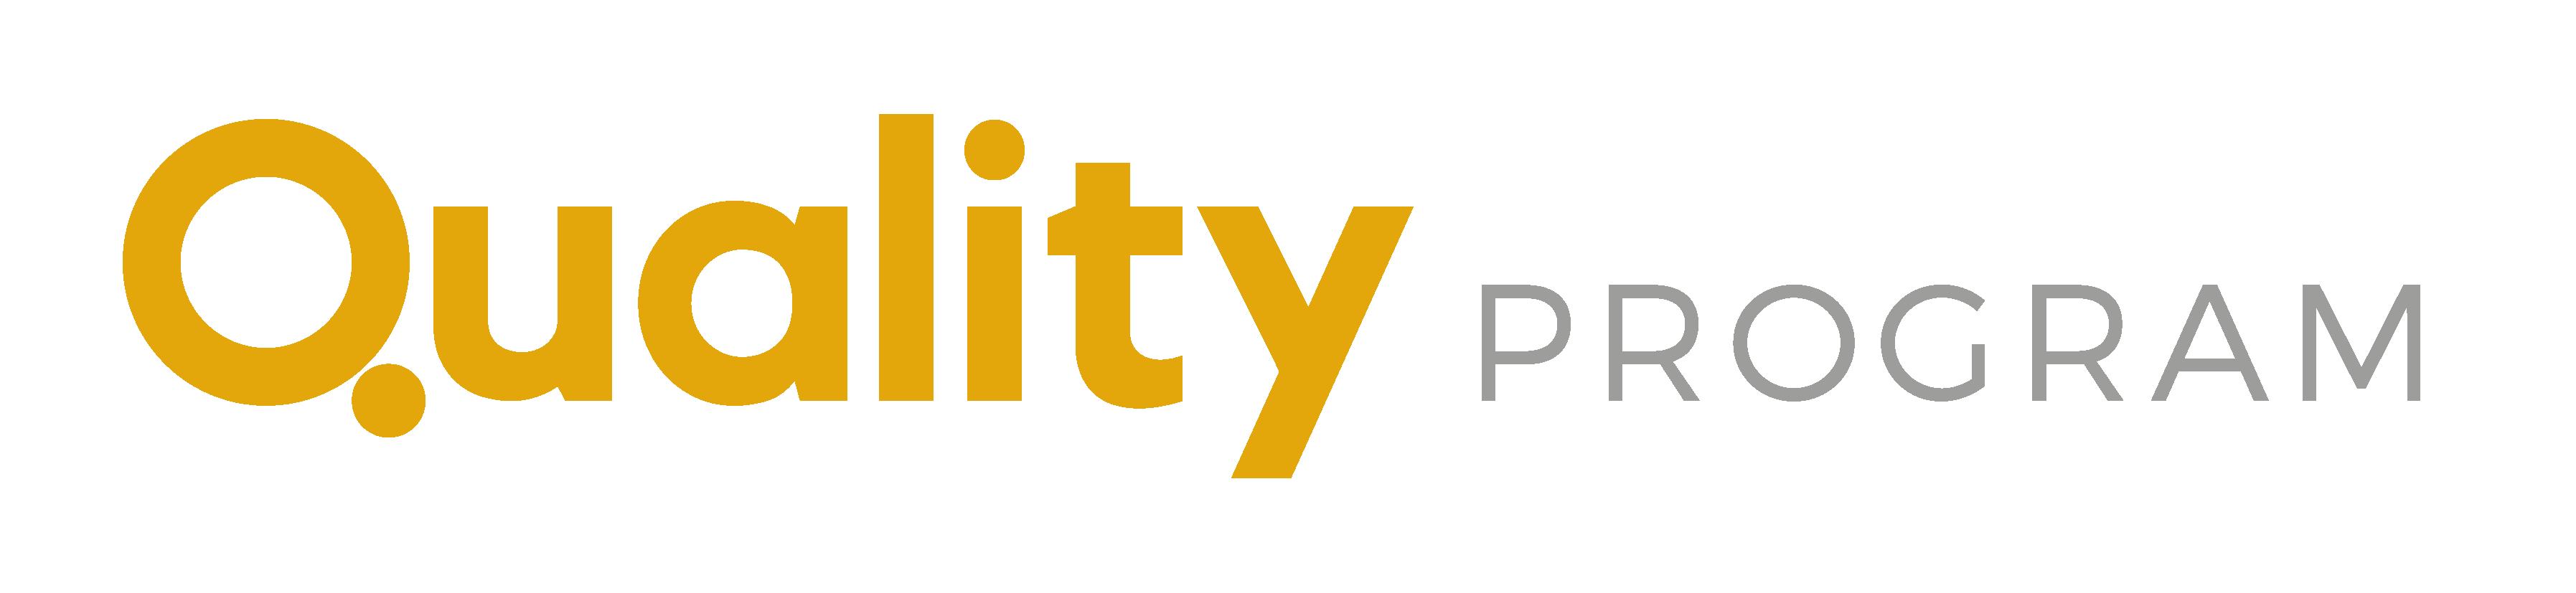 Quality Program